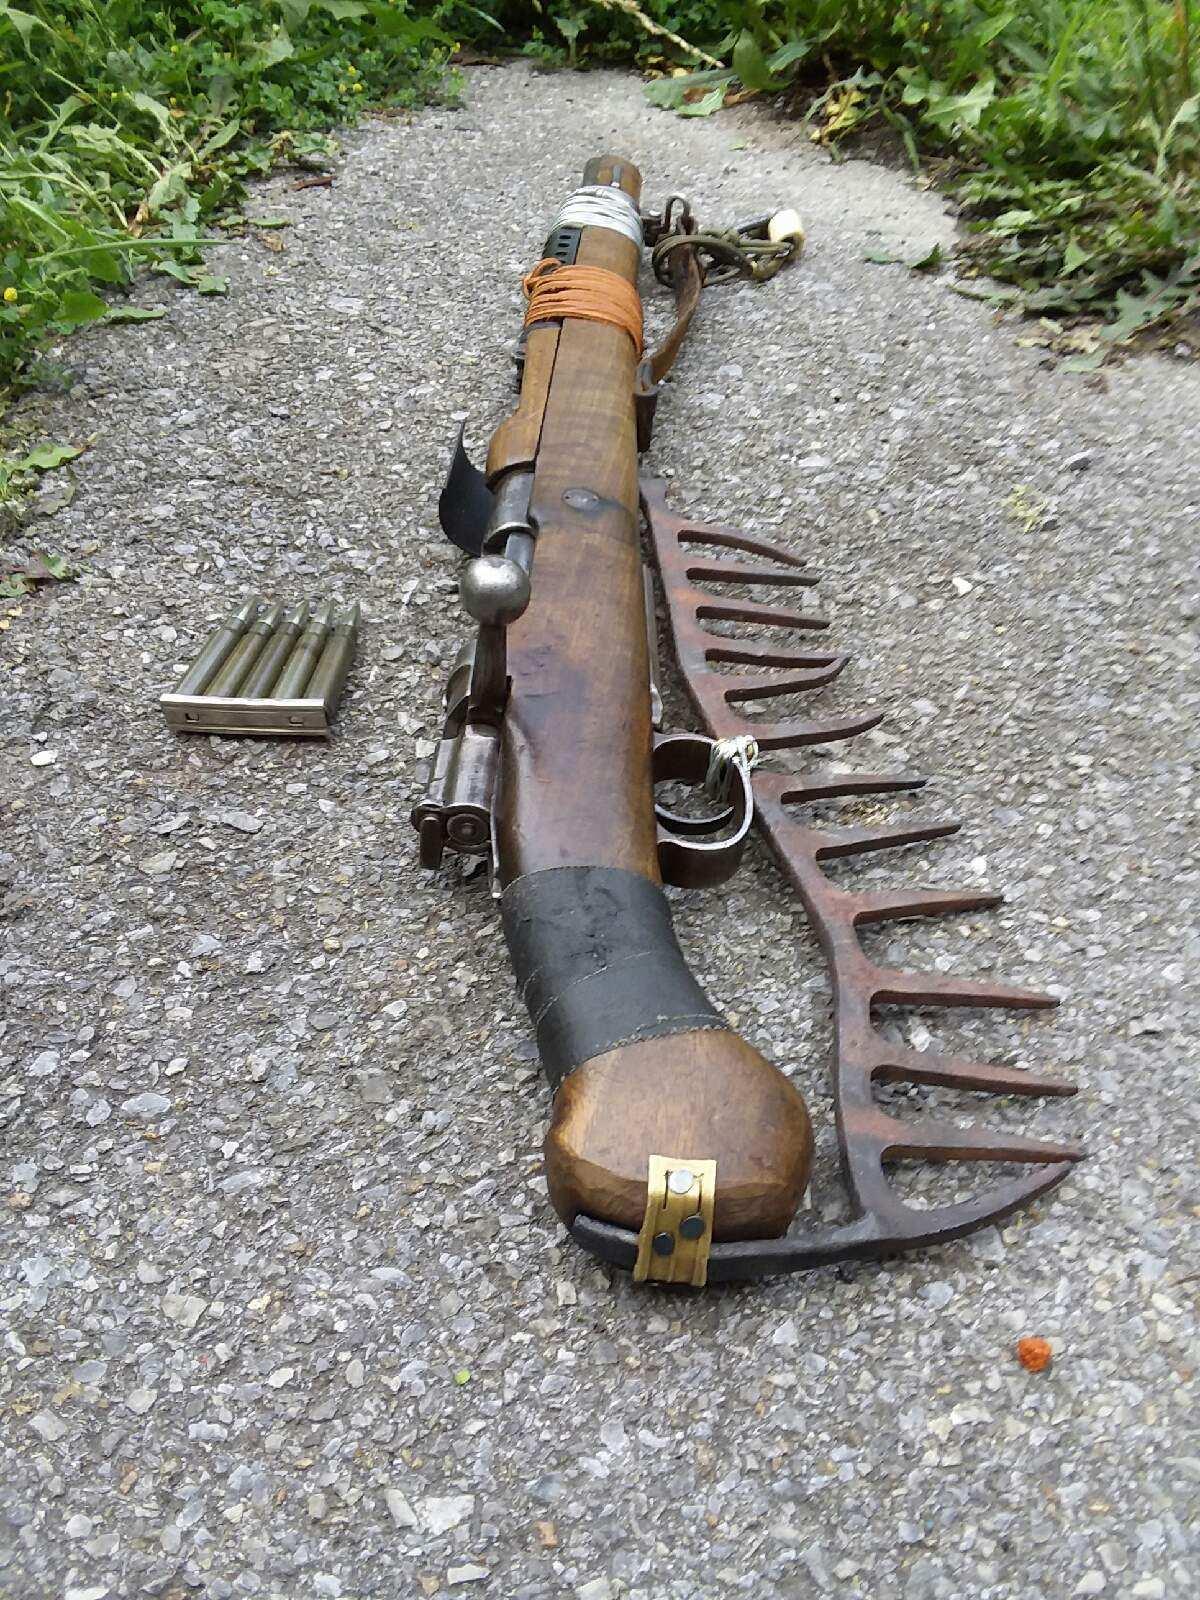 post apocalyptic style custom rifle builds mauser AR-15 4